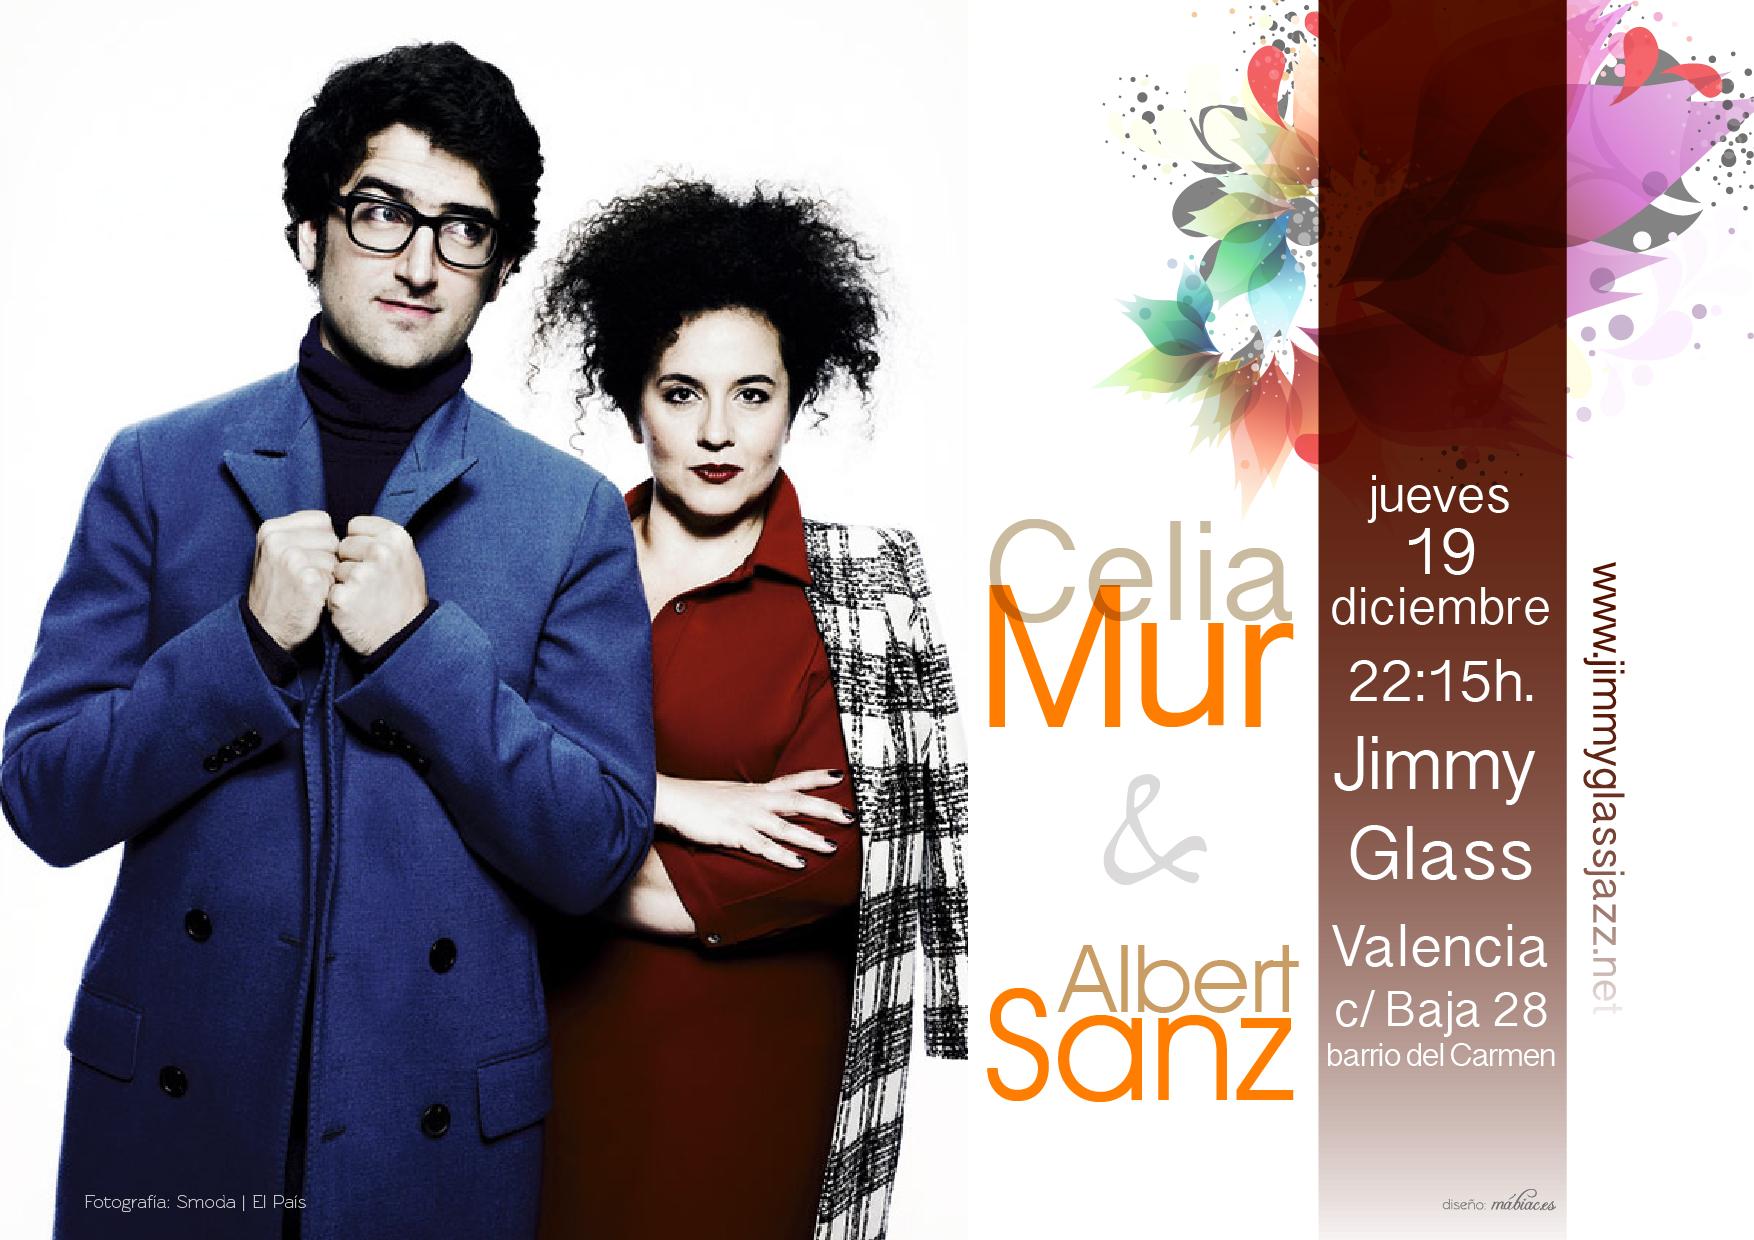 Celia Mur y Albert Sanz